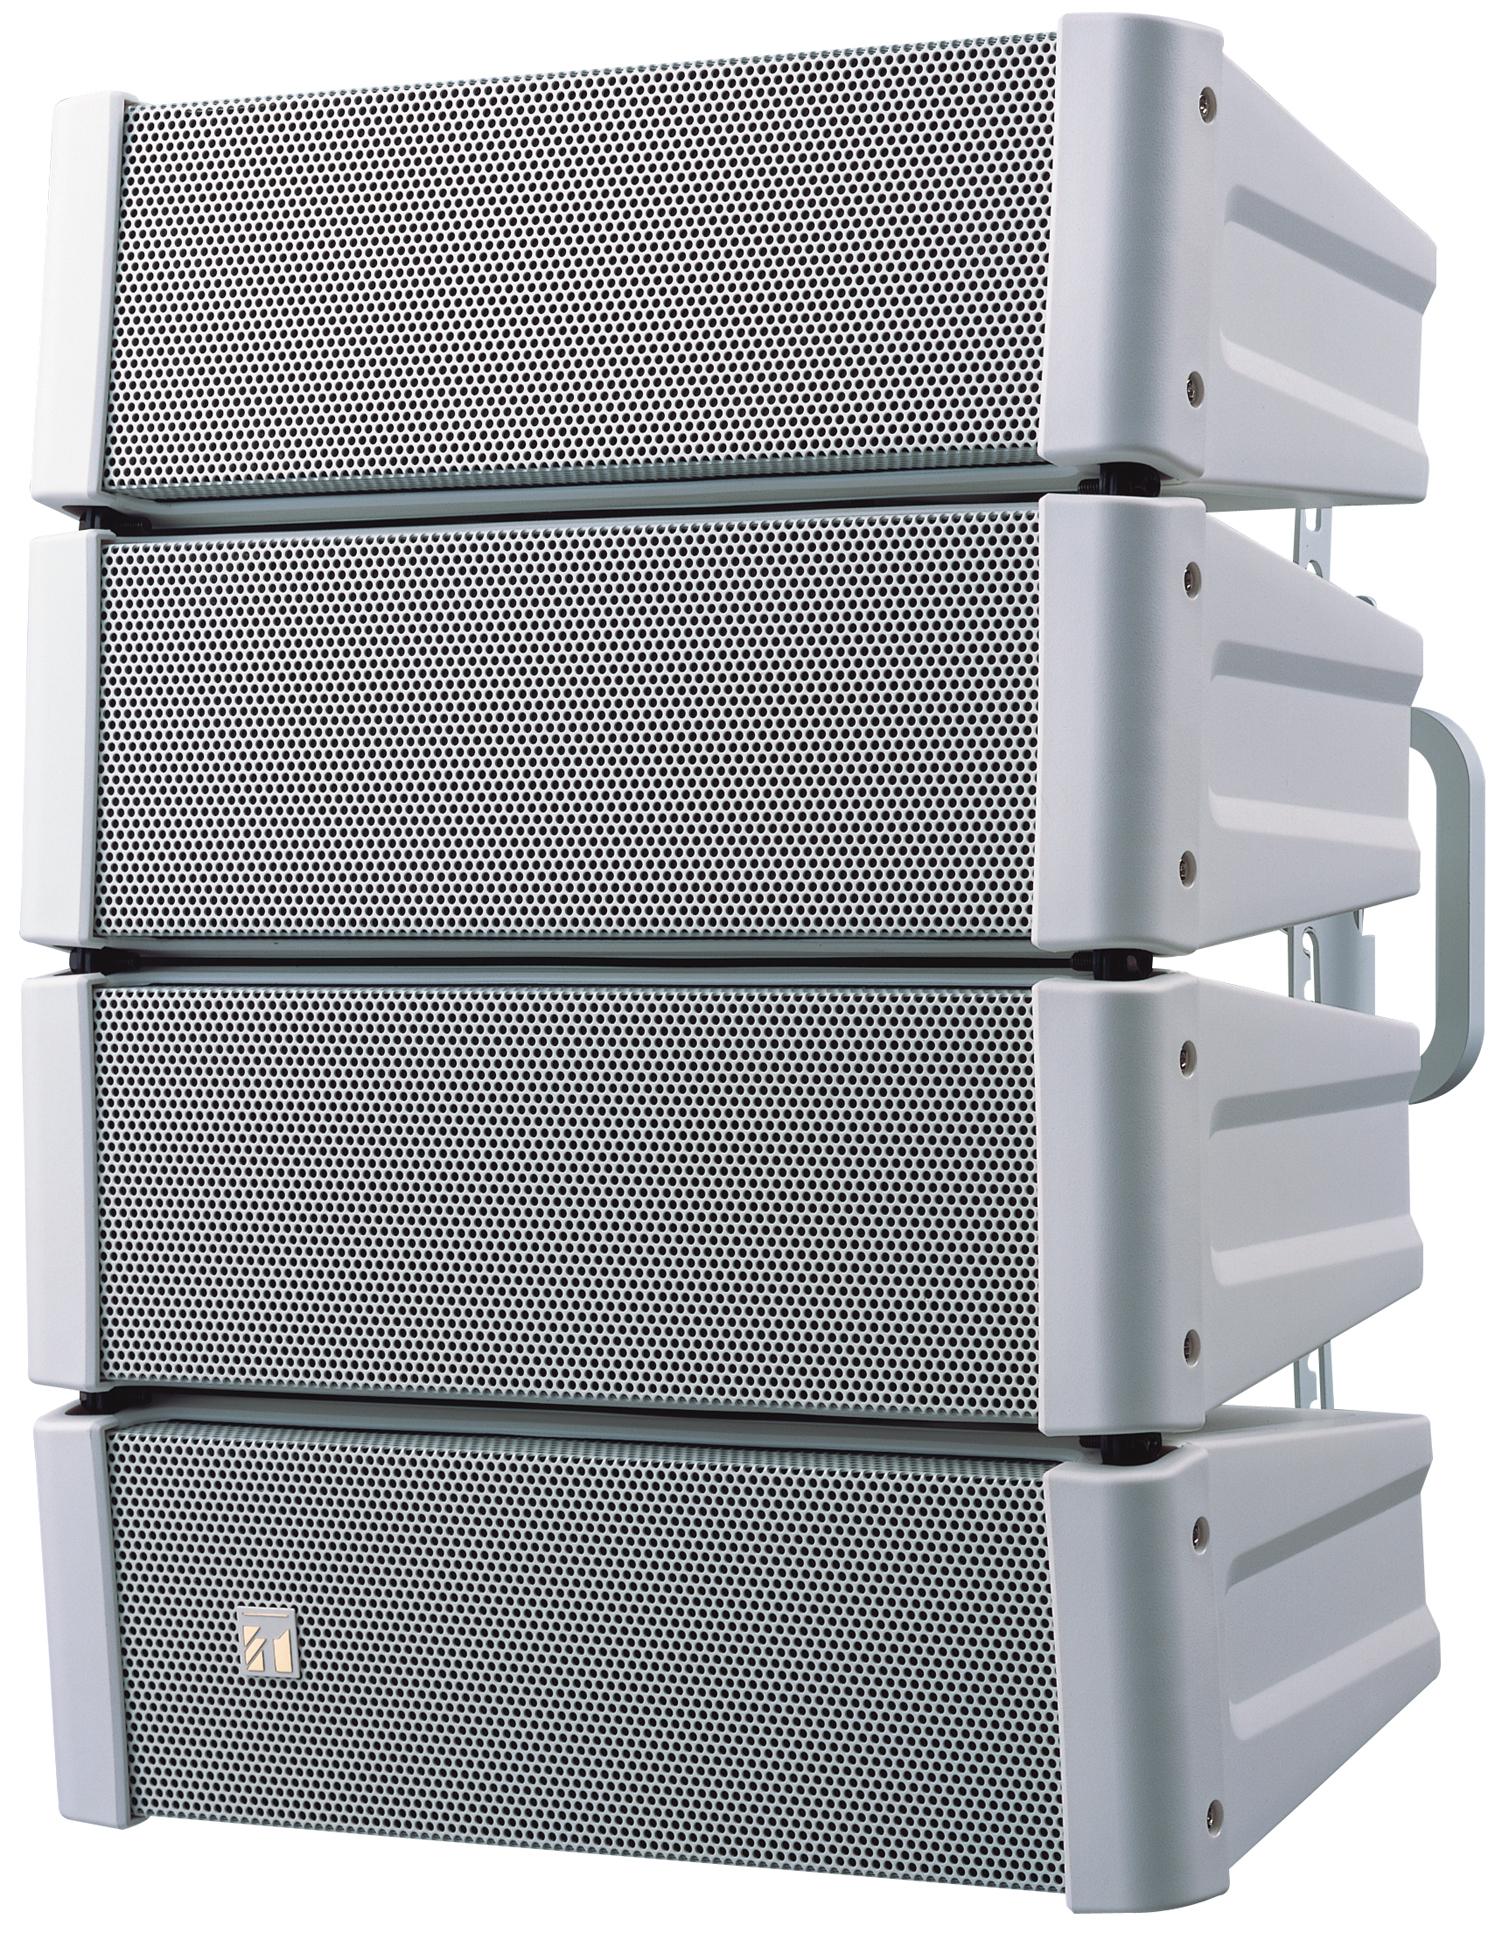 TOA HX-5W Compact Line Array Speaker System (Black)